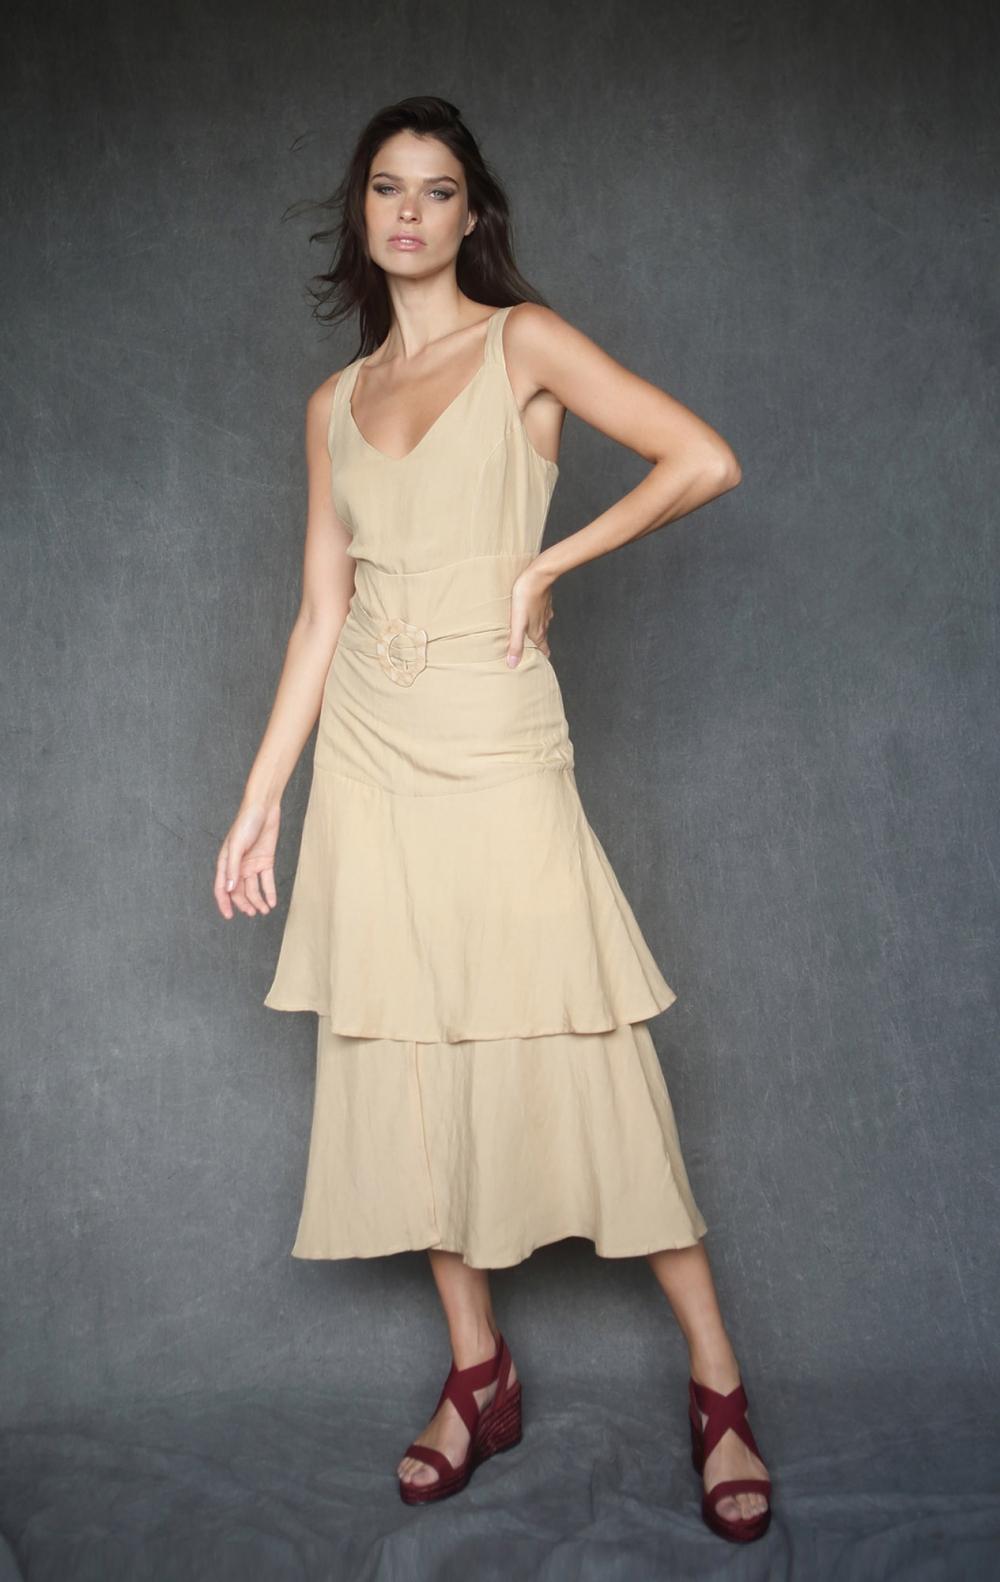 Vestido Cinto Fivela Bambu - Foto 1